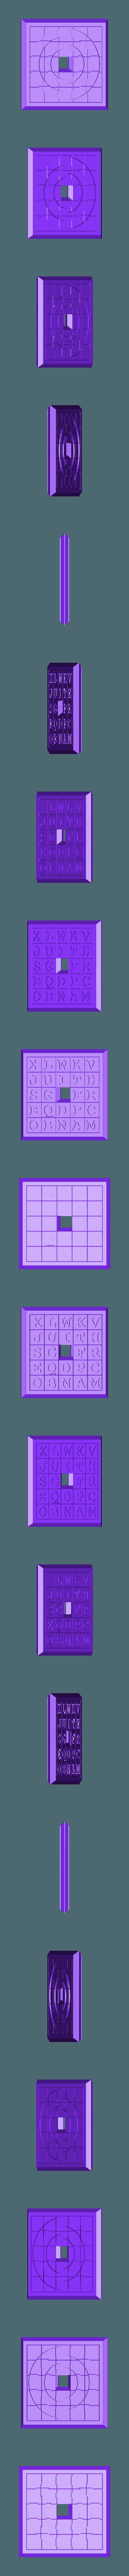 Sliding5x5Puzzle4.stl Download STL file Two Sided Sliding Puzzle • 3D printable model, Jinja